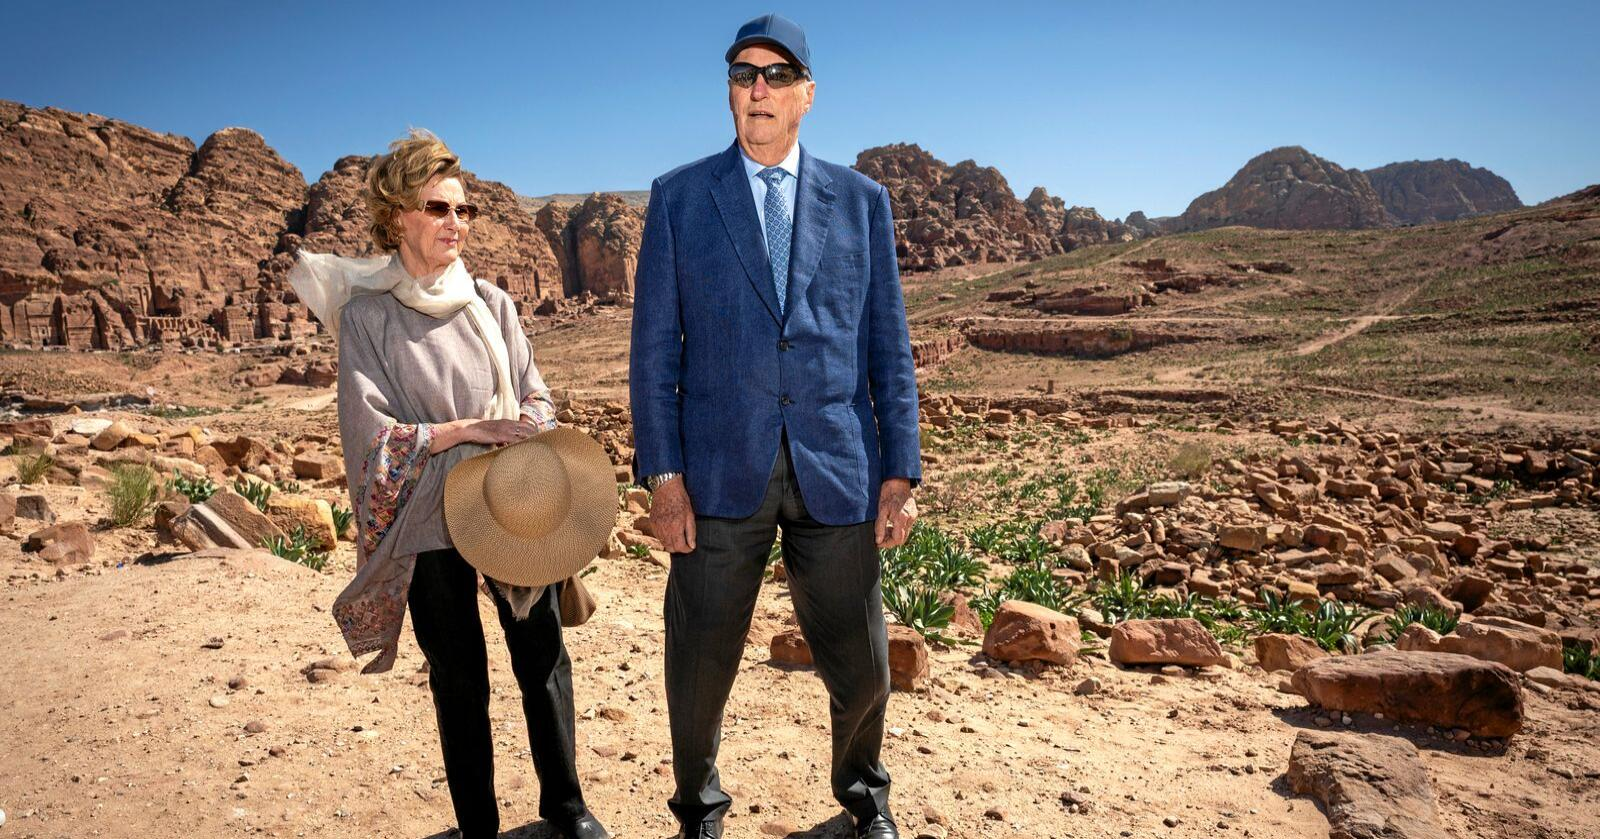 Kong Harald og dronning Sonja fartar rundt. Her er dei på besøk i oldtidsbyen Petrea i Jordan under eit statsbesøk. Foto: Heiko Junge / NTB scanpix